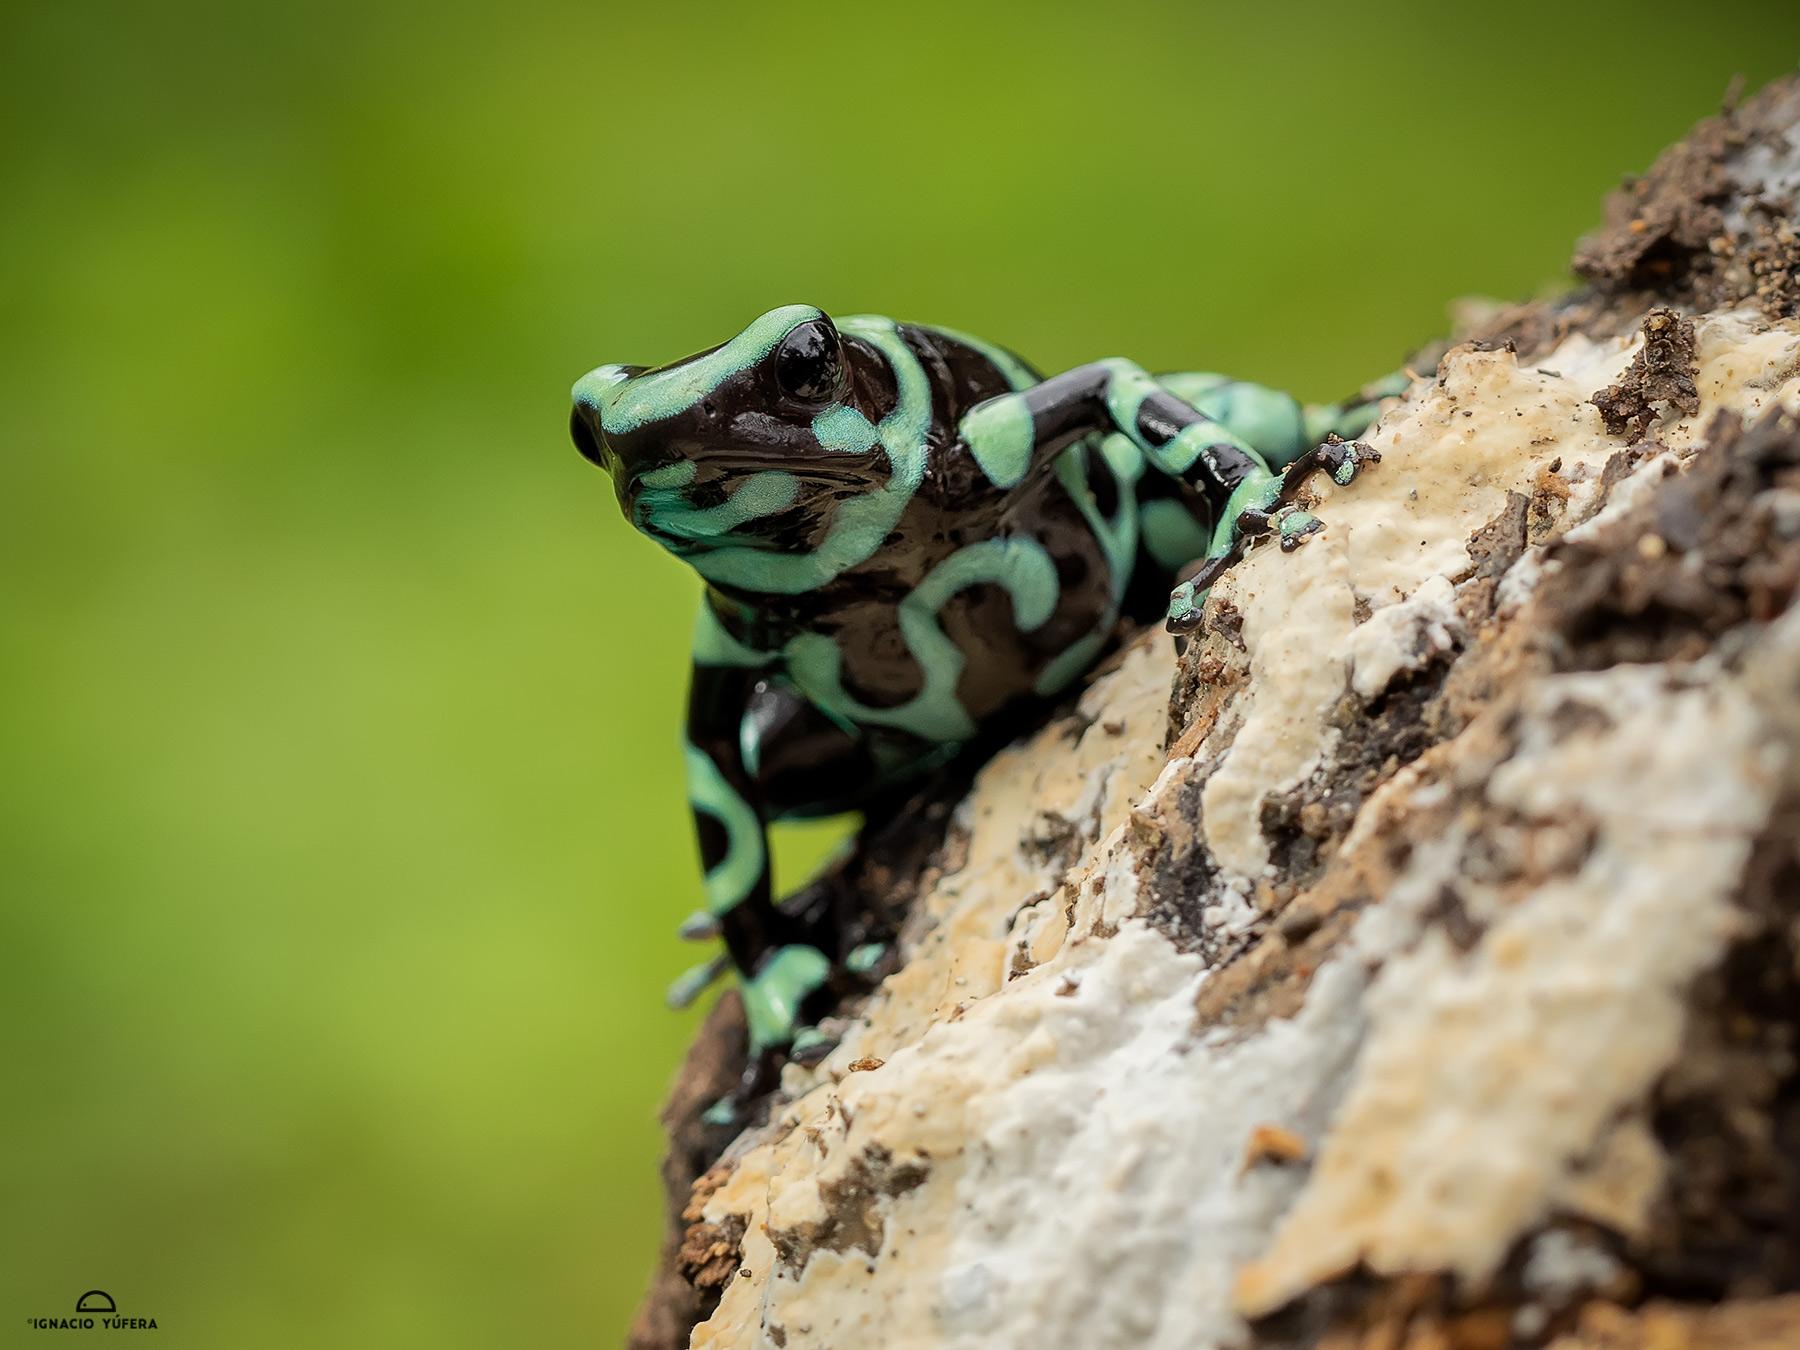 Green-and-black Poison Dart Frog (Dendrobates auratus), Fortuna, Panama, June